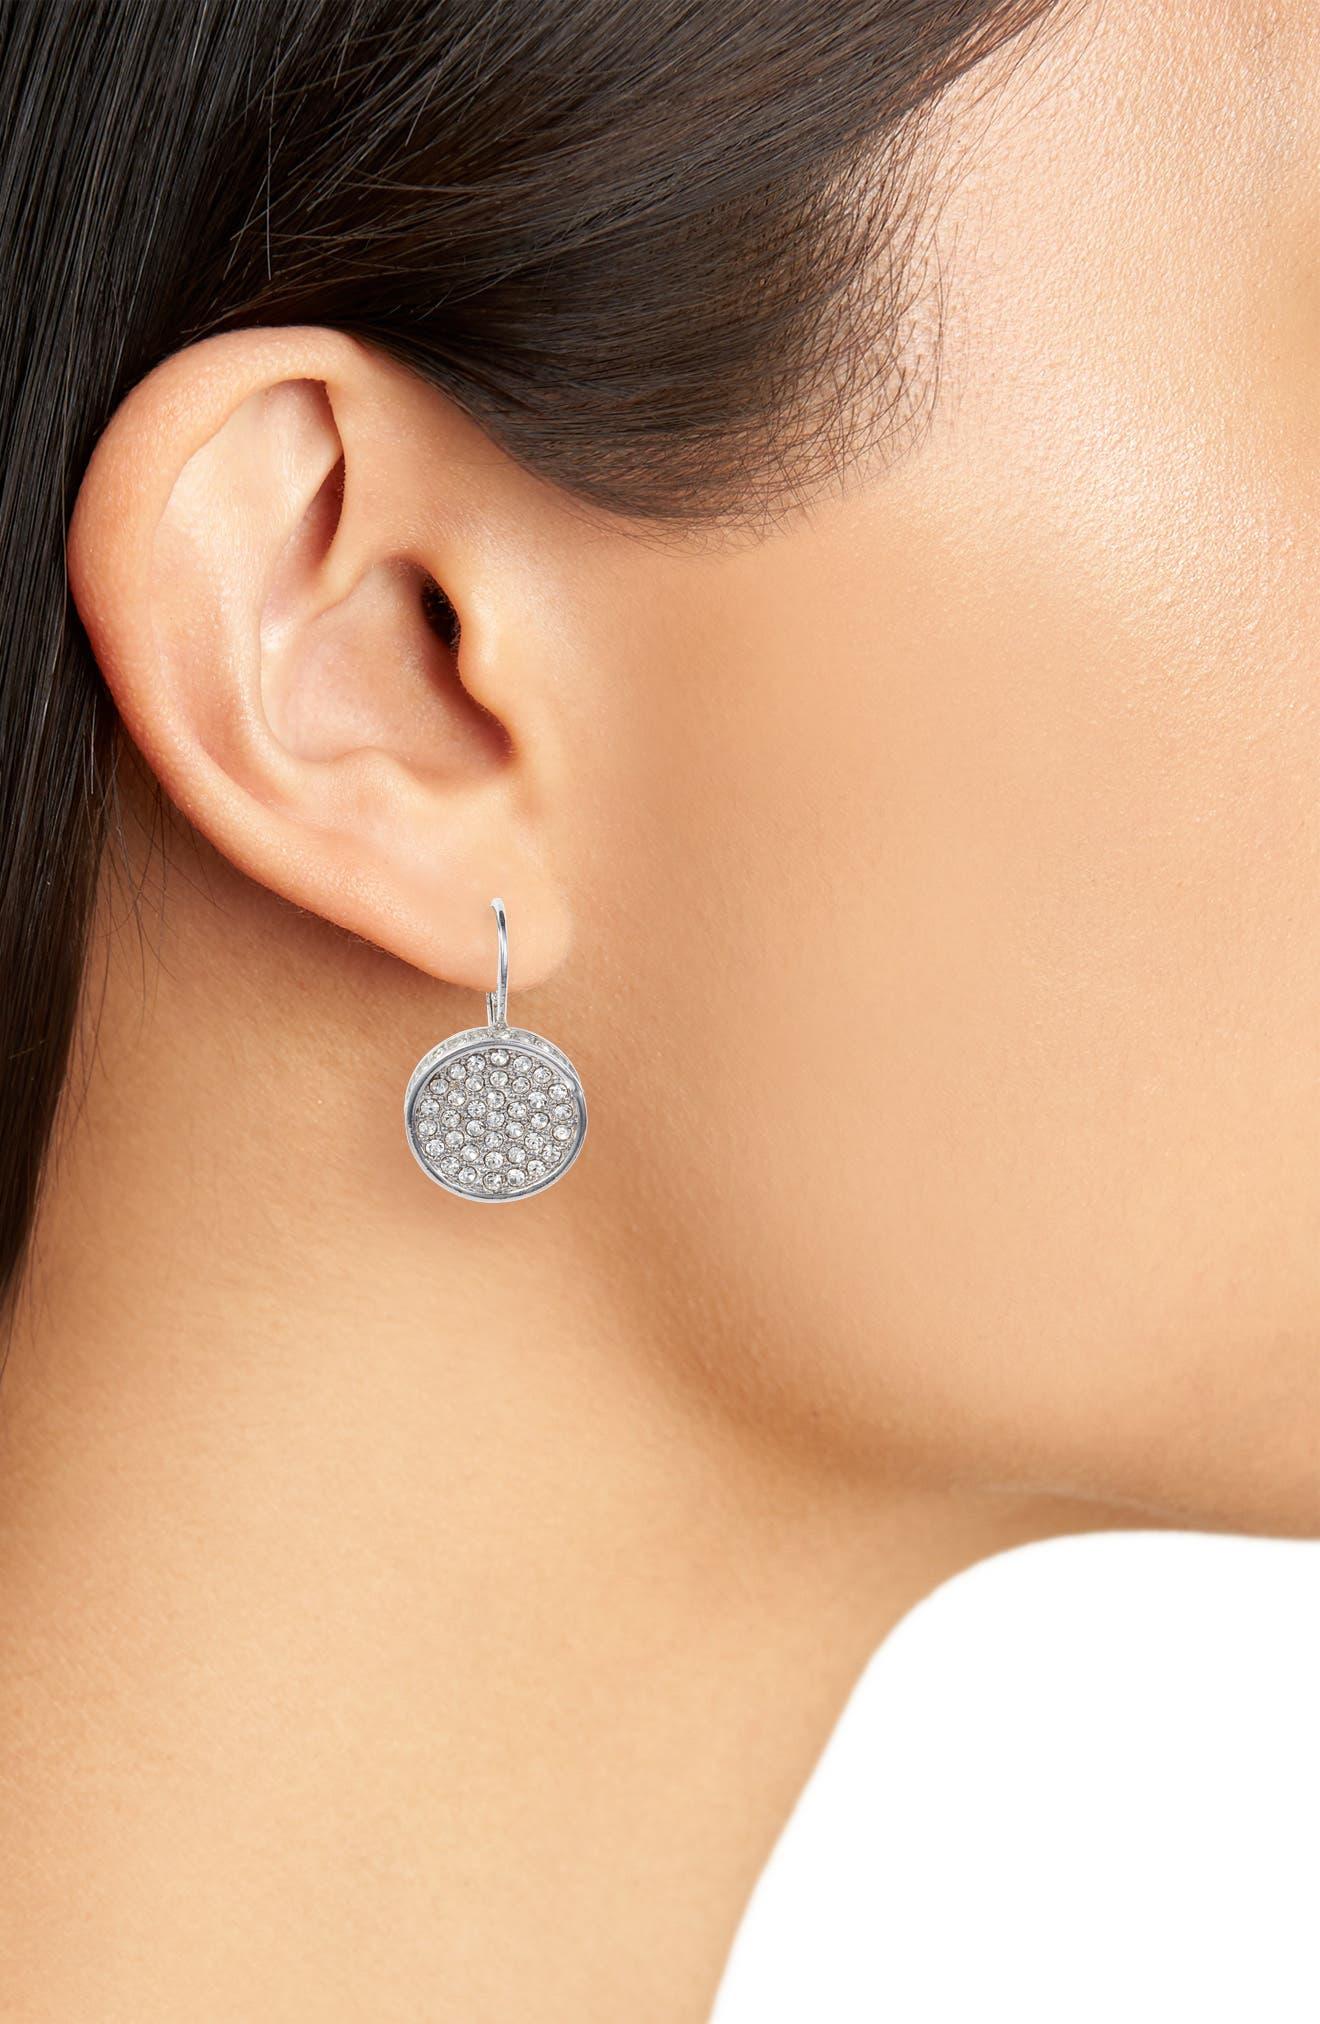 Crystal Glitter Earrings,                             Alternate thumbnail 2, color,                             Silver/ Crystal